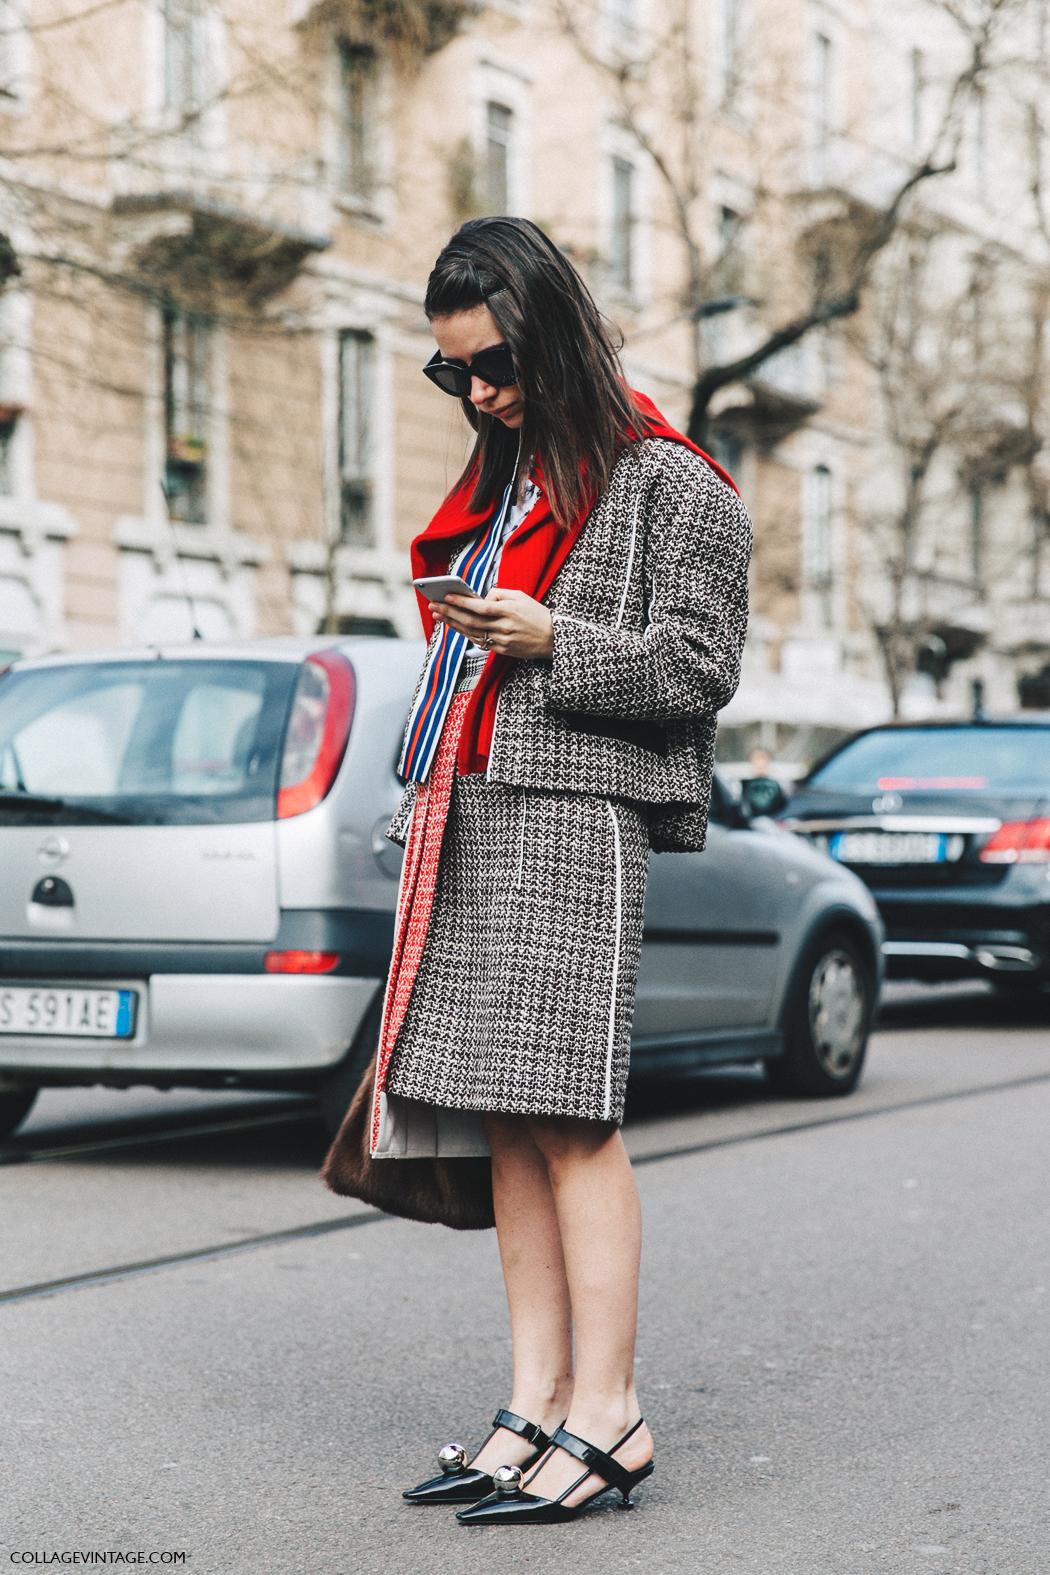 Milan_Fashion_Week_Fall_16-MFW-Street_Style-Collage_Vintage-Natasha_Goldenberg-1